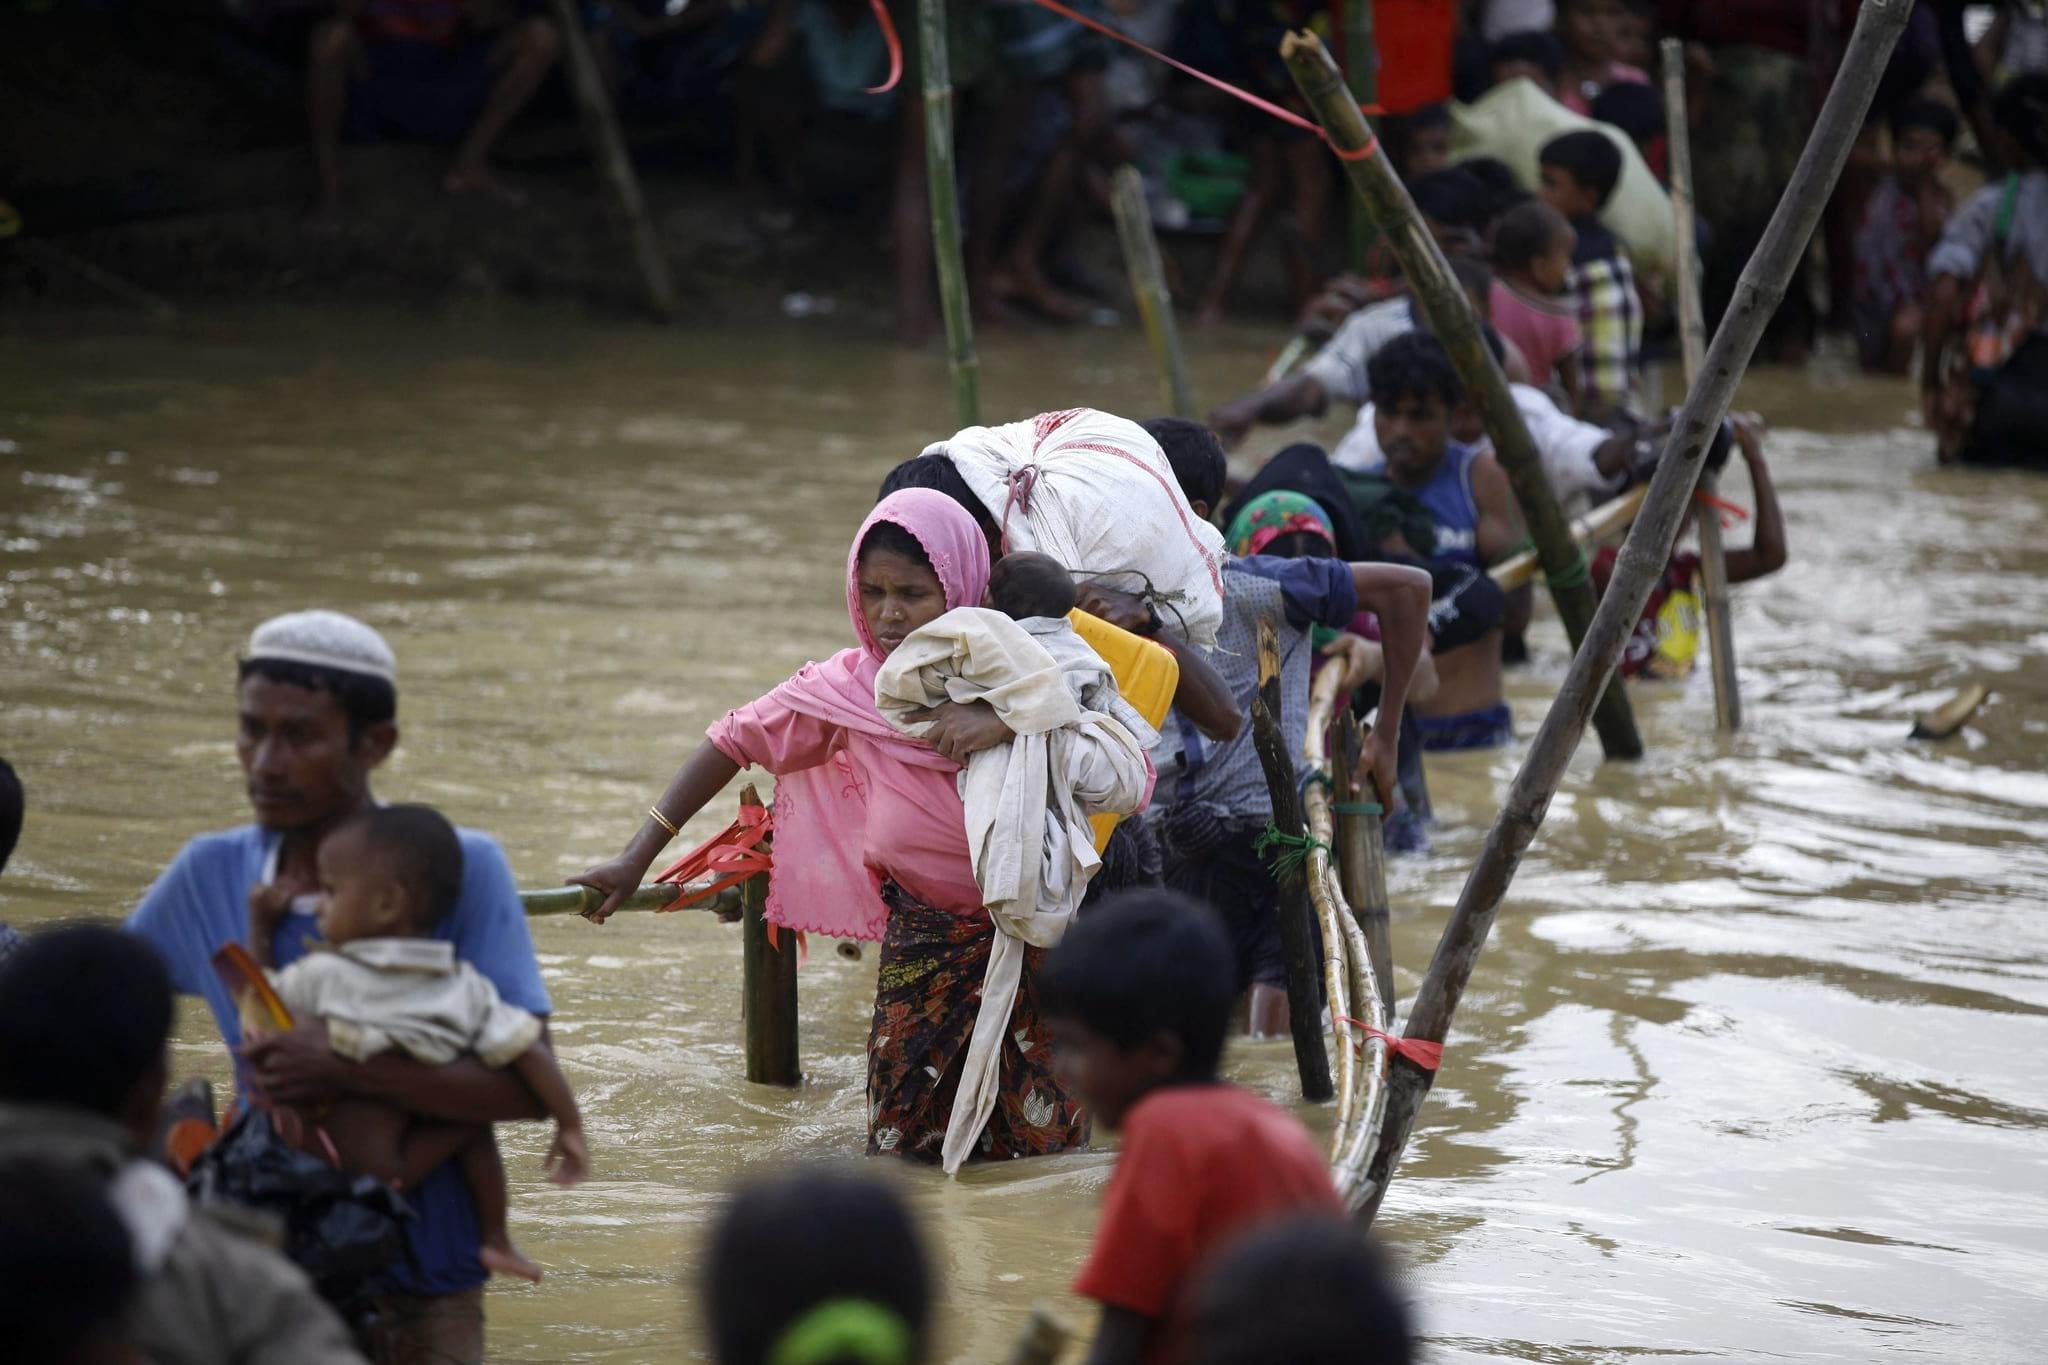 PÚBLICO - Facebook acusado de silenciar minoria étnica na Birmânia